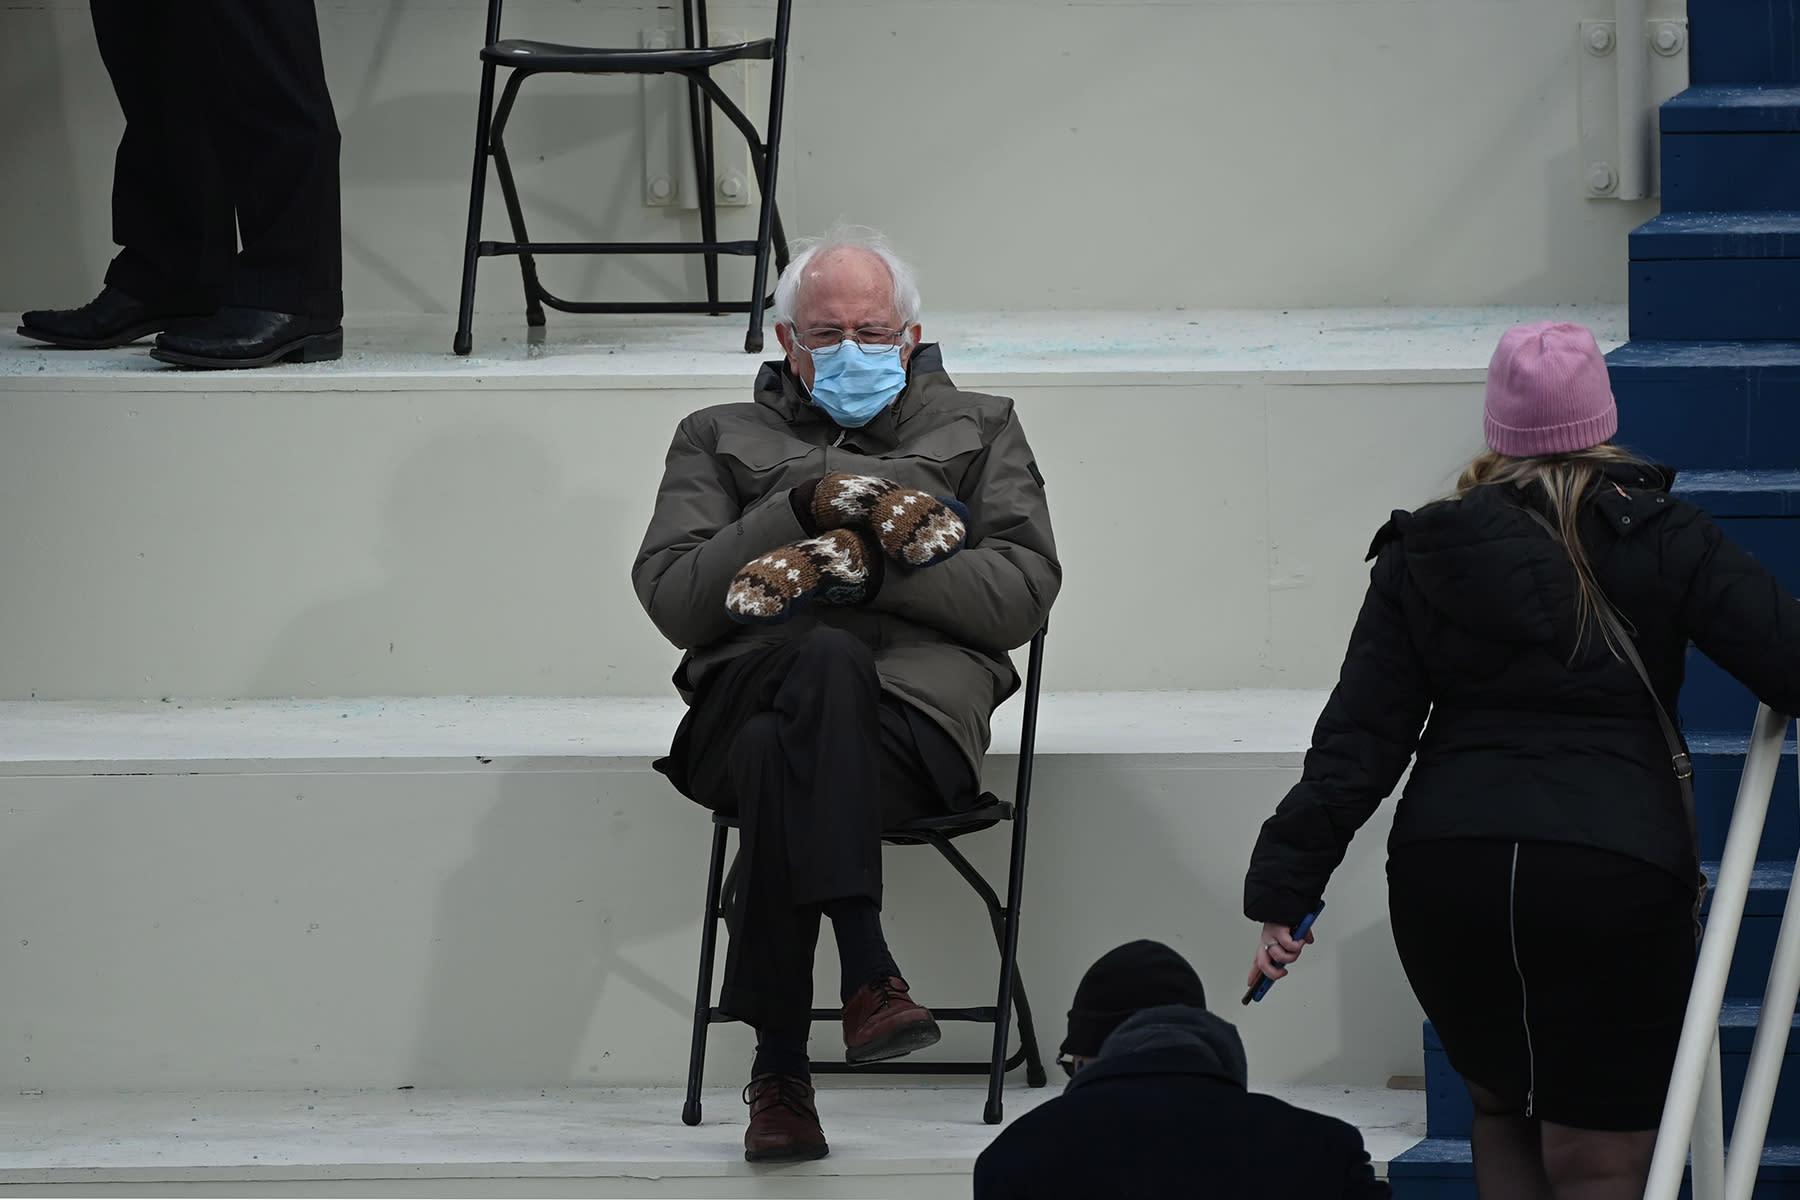 The Photographer Behind The Bernie Sanders Chair Meme Tells All